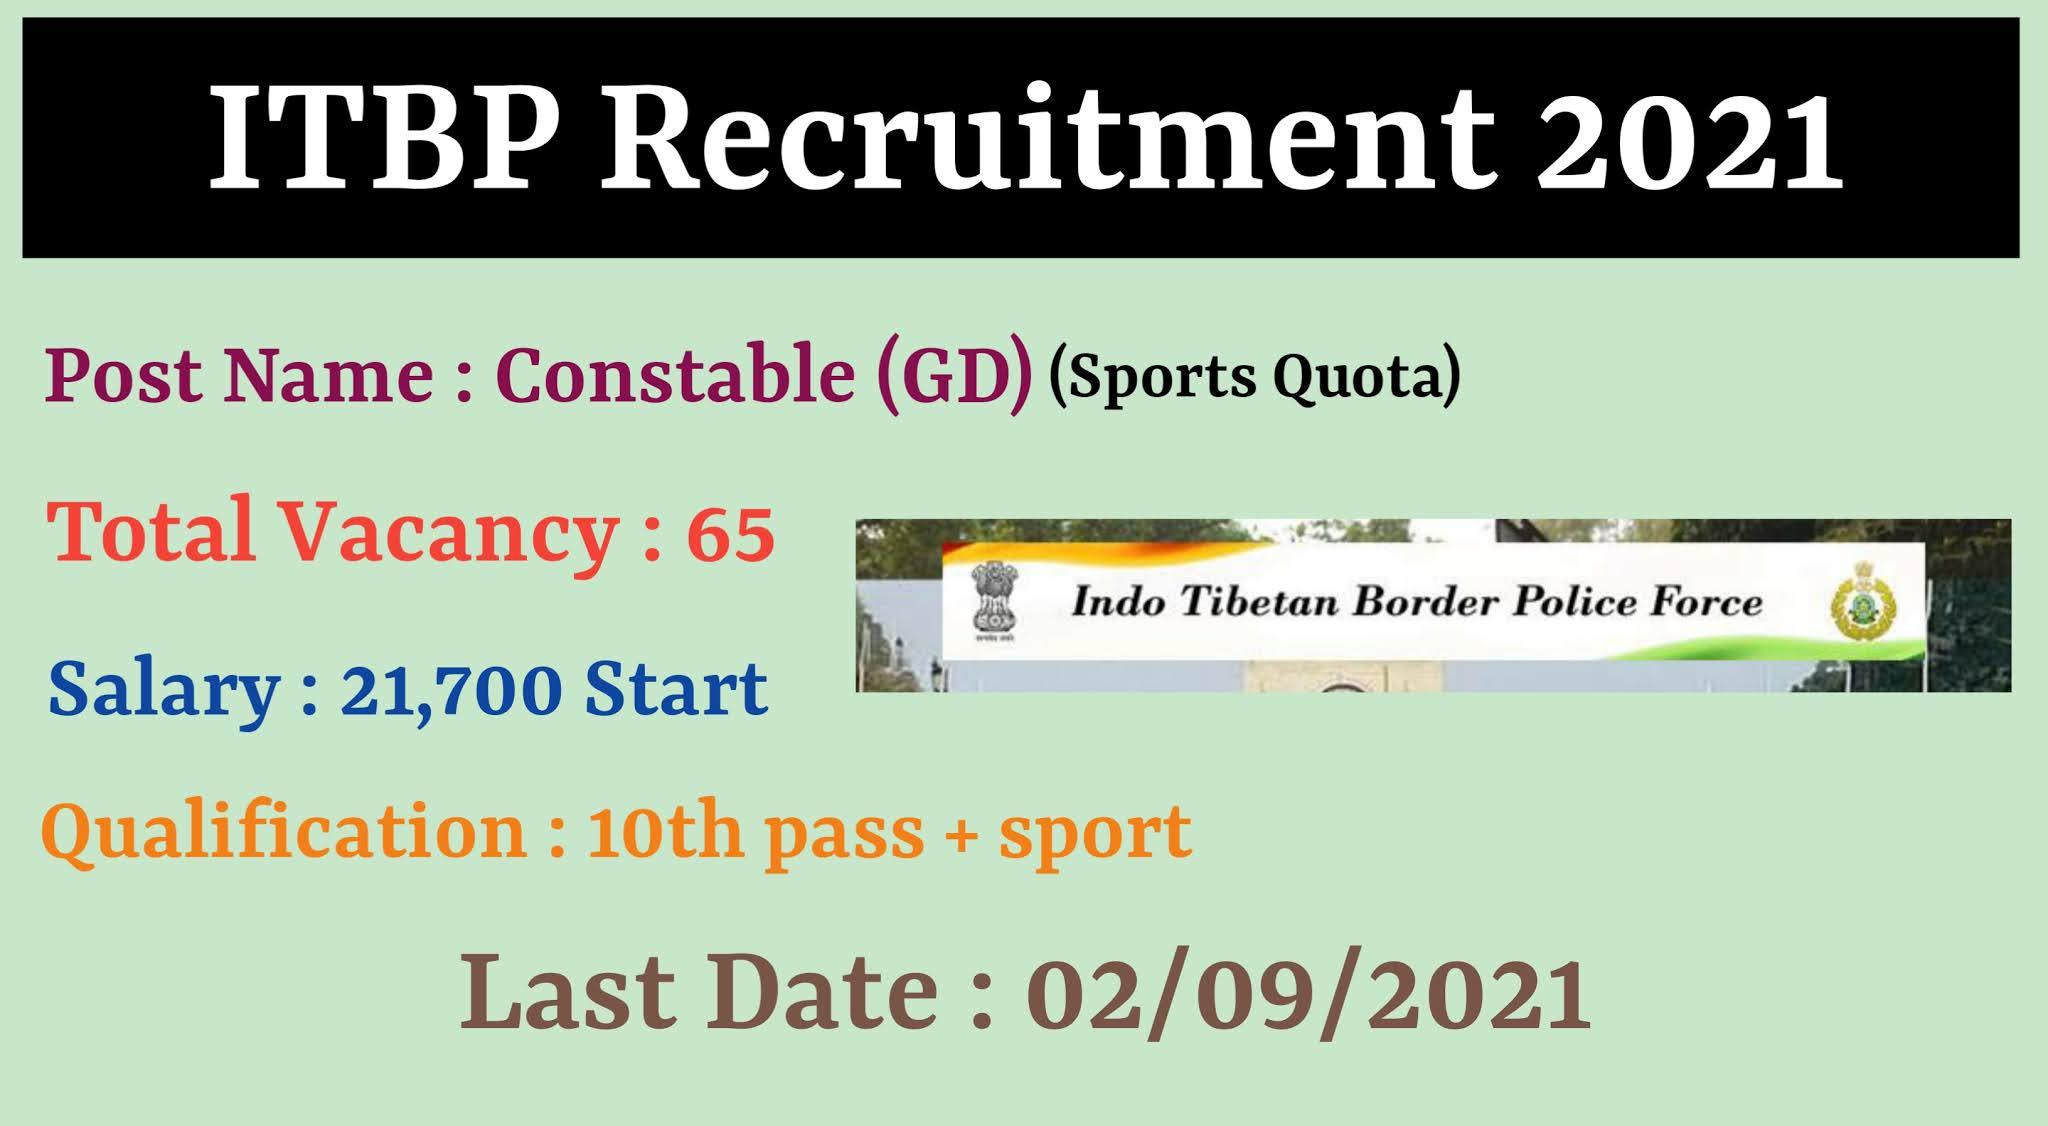 ITBP Constable GD Recruitment 2021 | ITBP Constrable GD Sport Quota Recruitment 2021